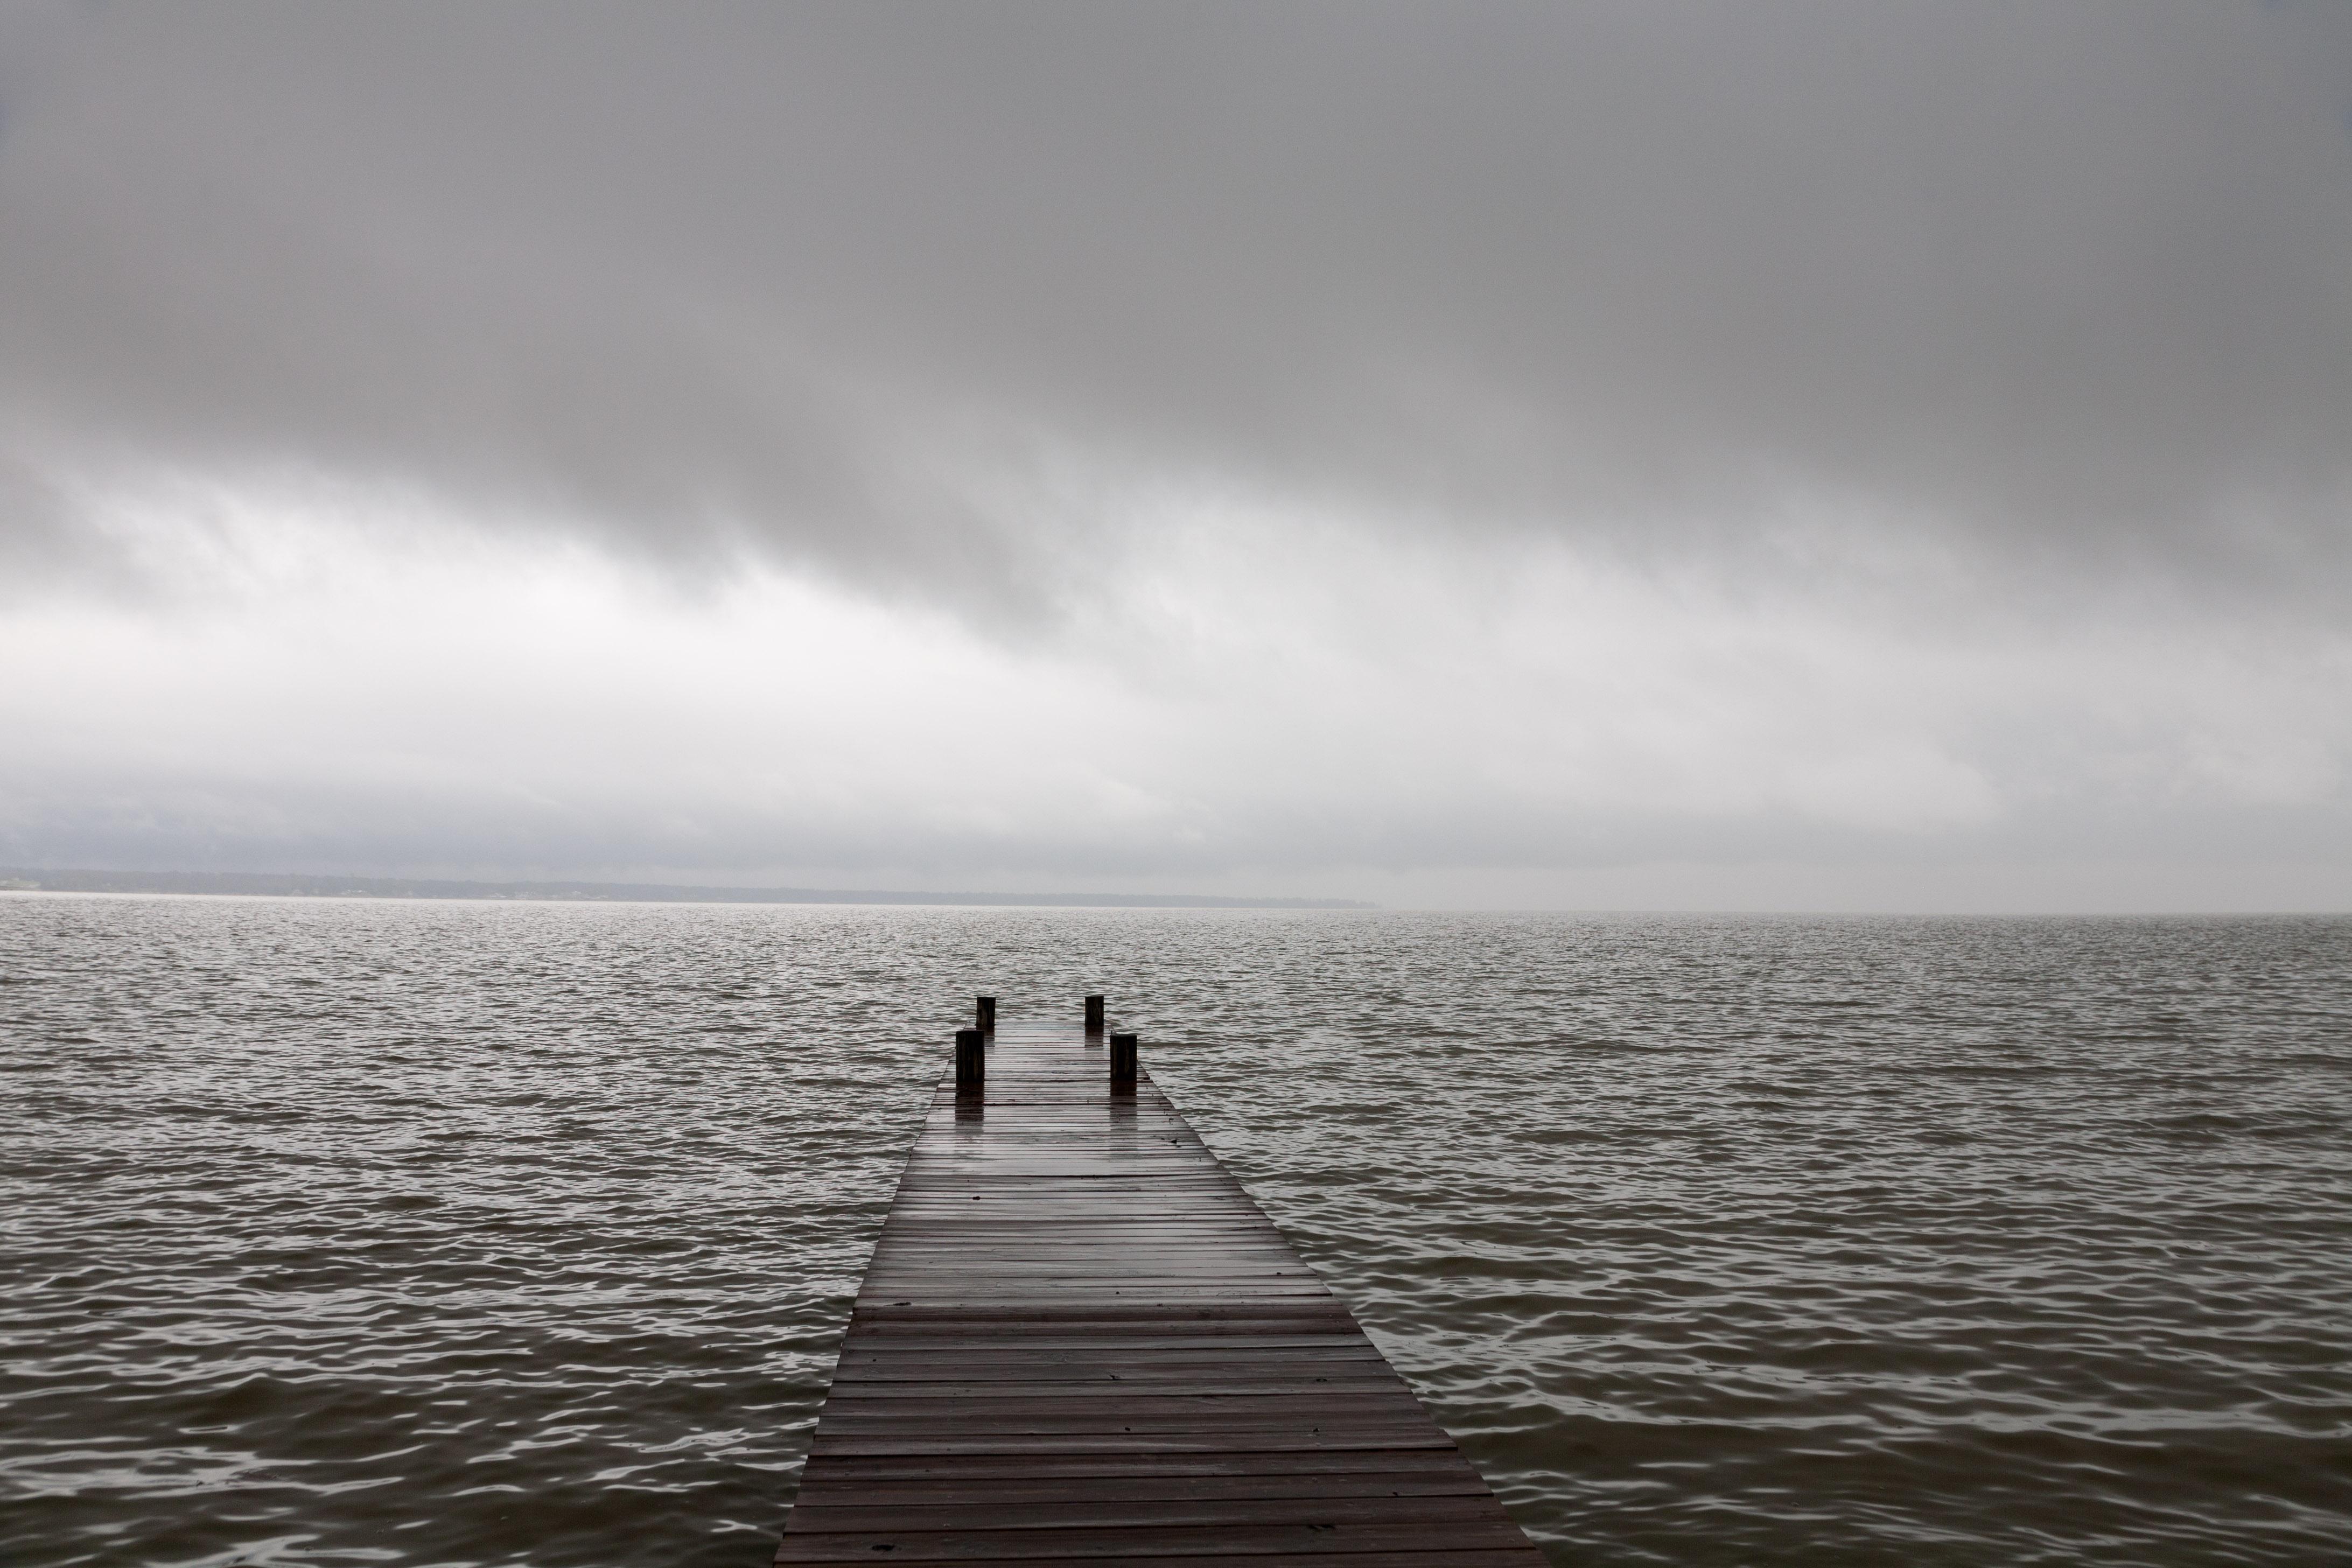 heidi_straube_Lake_Livingston_image_dock_inner_path_of_photography